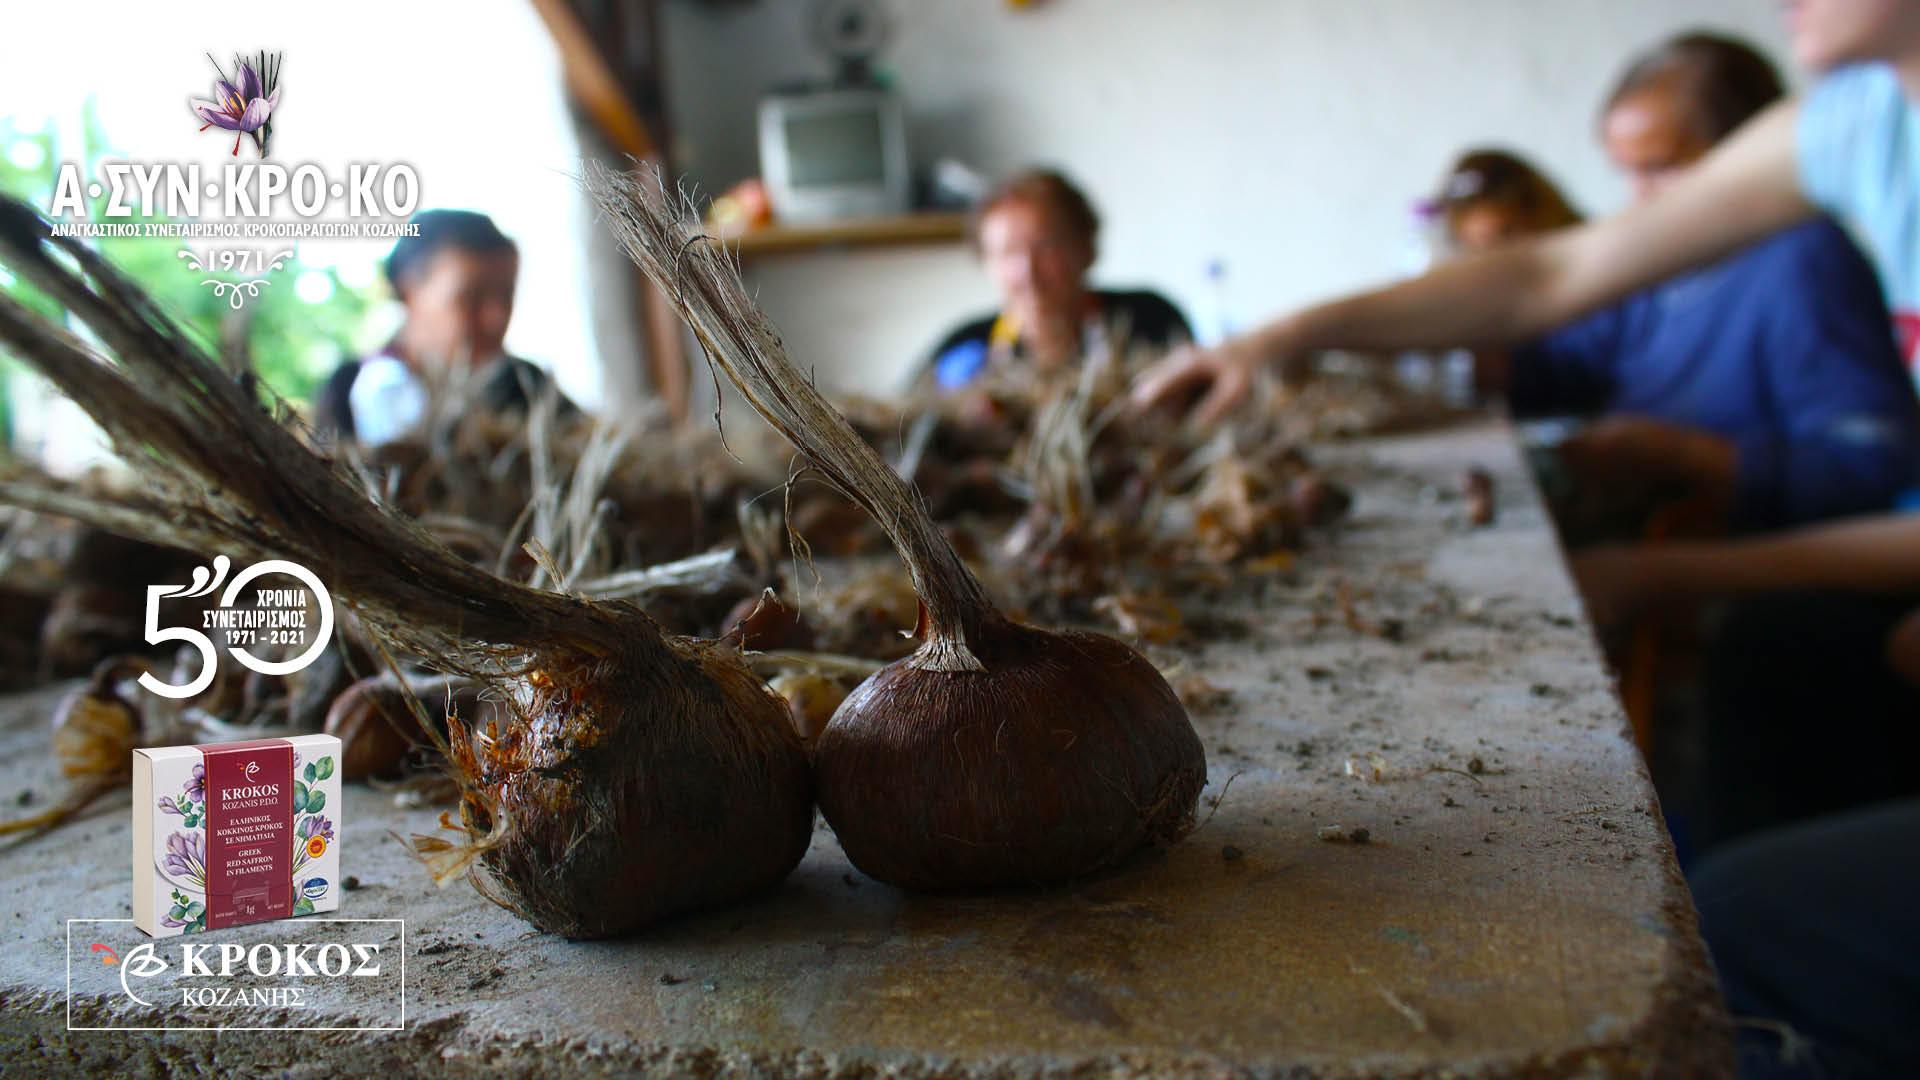 Read more about the article Καλλιέργεια του Κρόκου στα χωράφια των αγροτών του Α.ΣΥΝ.ΚΡΟ.ΚΟ